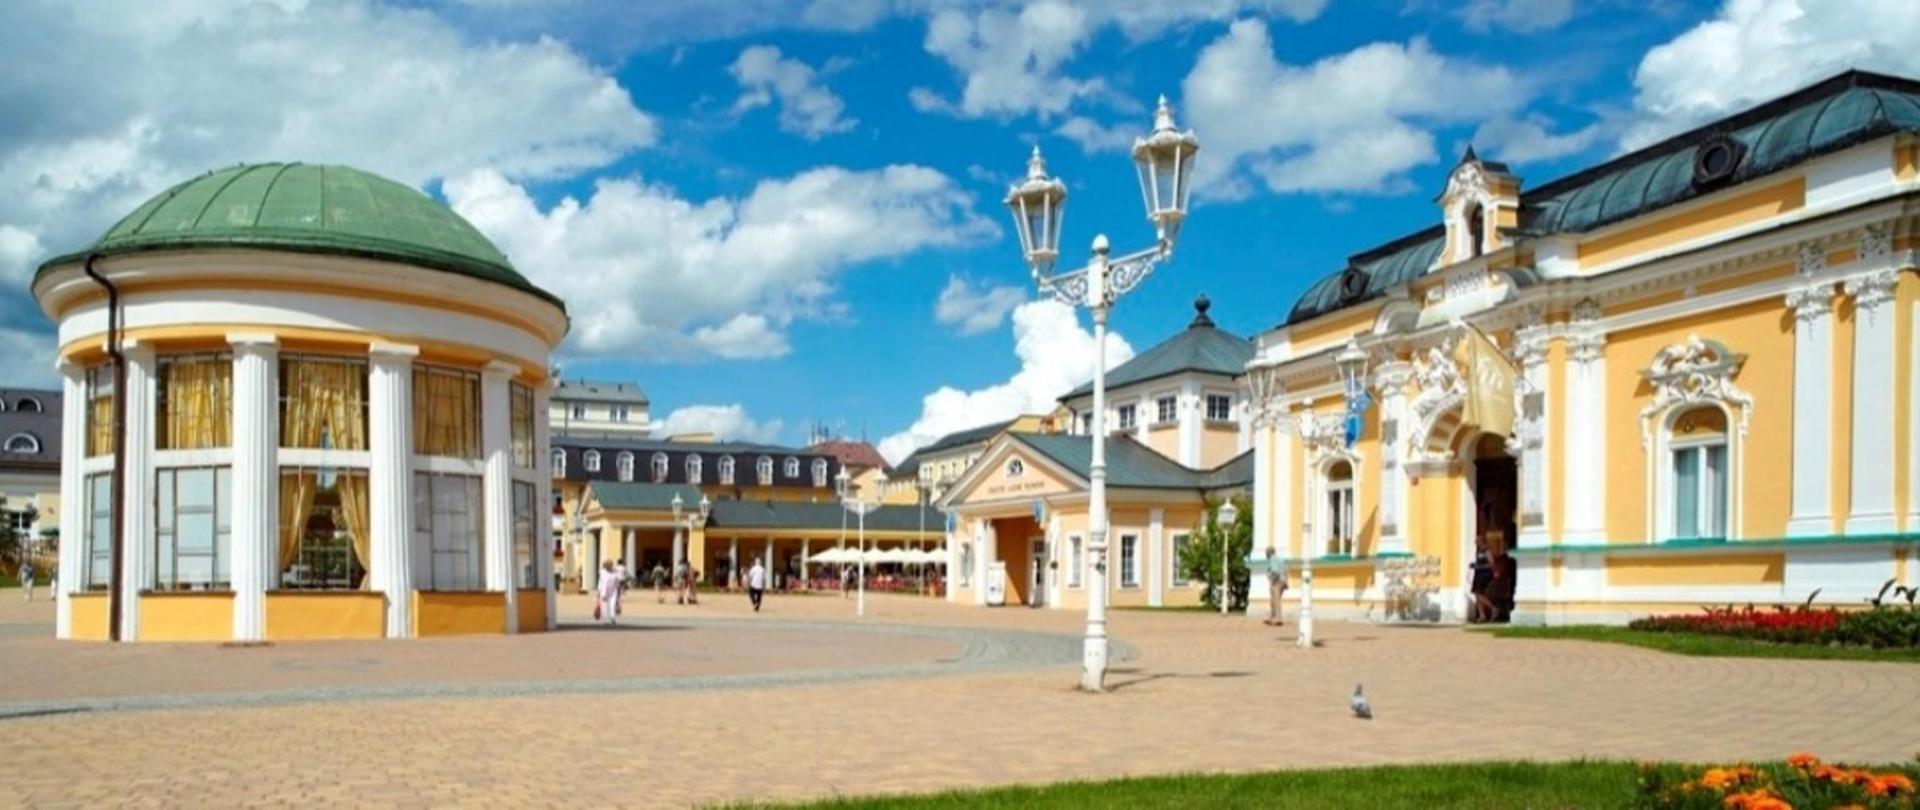 Františkovy_Lázně_Franzesbad7-1280x455 (1).jpg